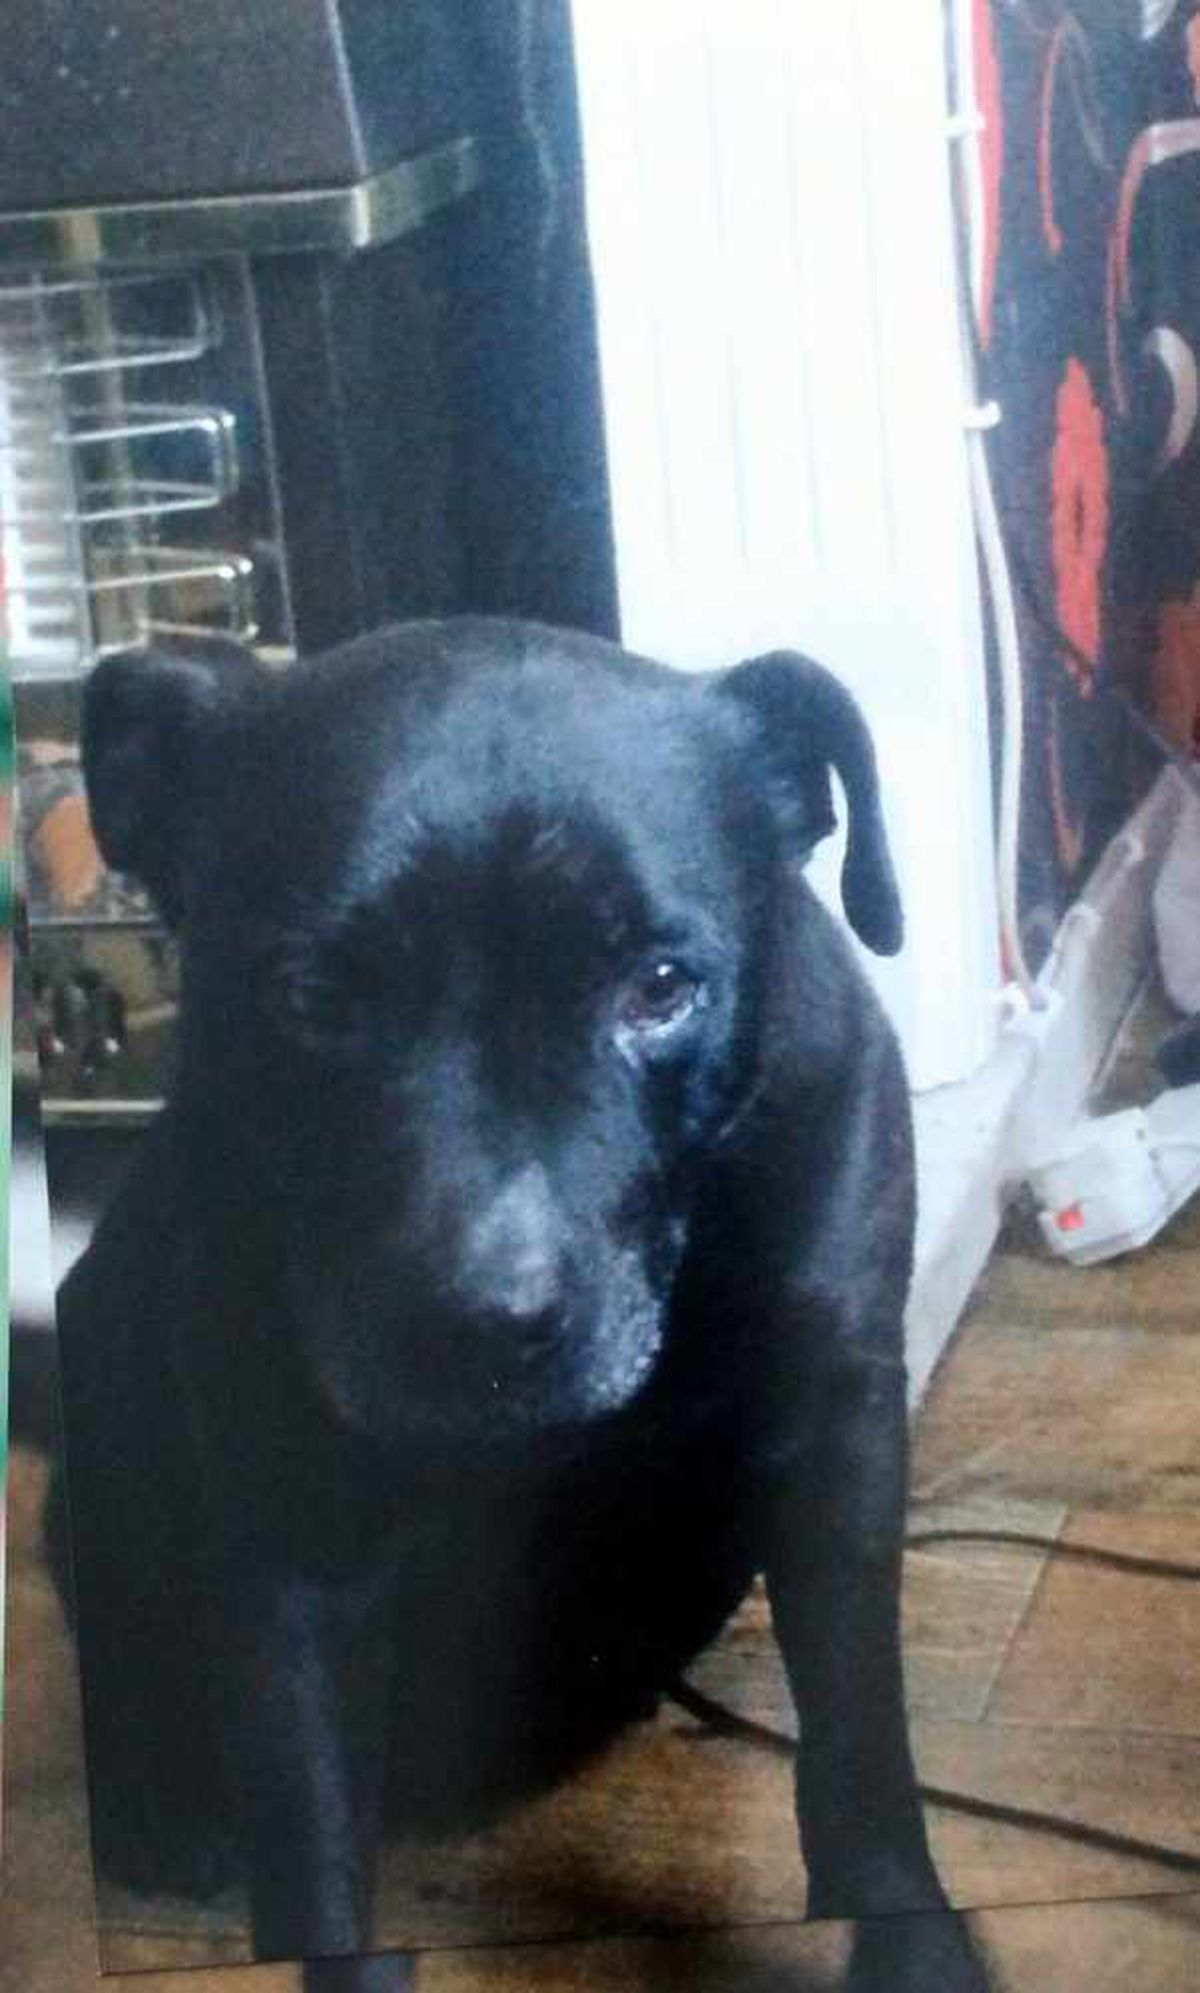 Joanne Wakeley's dog Ebony